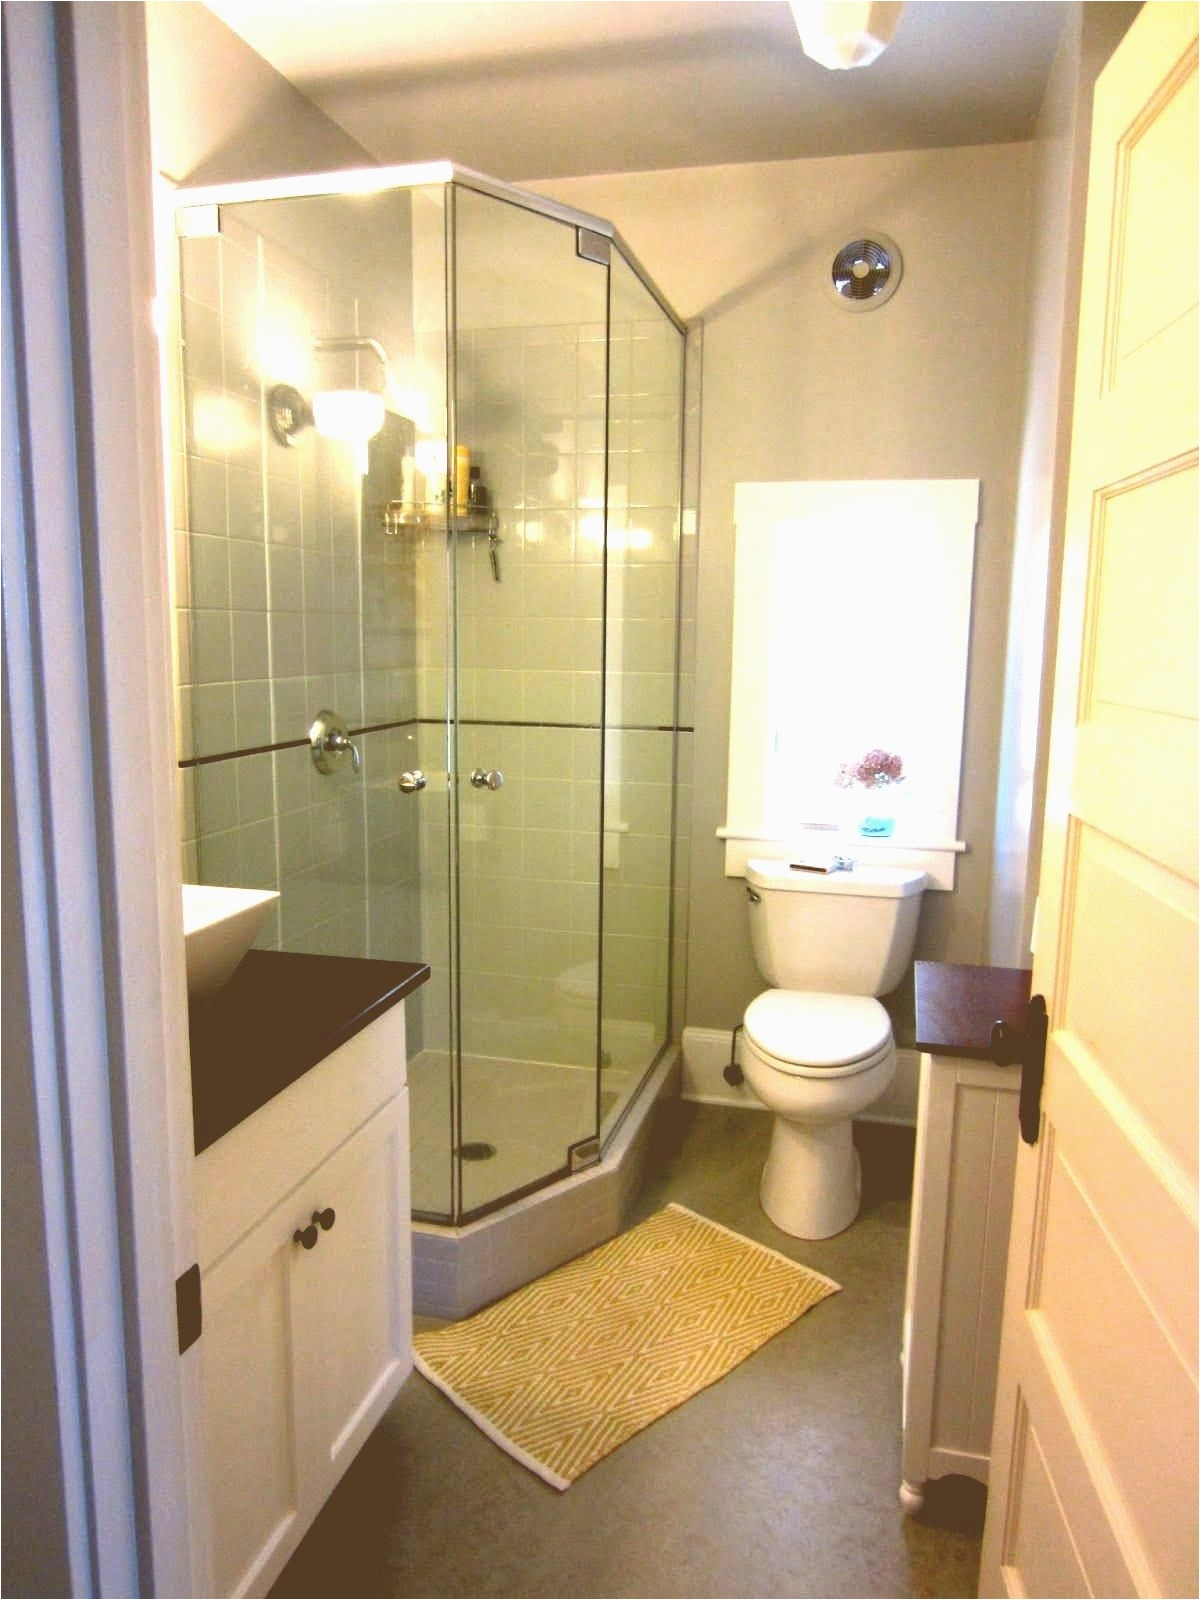 Corridor Bathroom Design Ideas Corridor Bathroom Design Ideas New 31 Luxury 5×5 Bathroom Layout